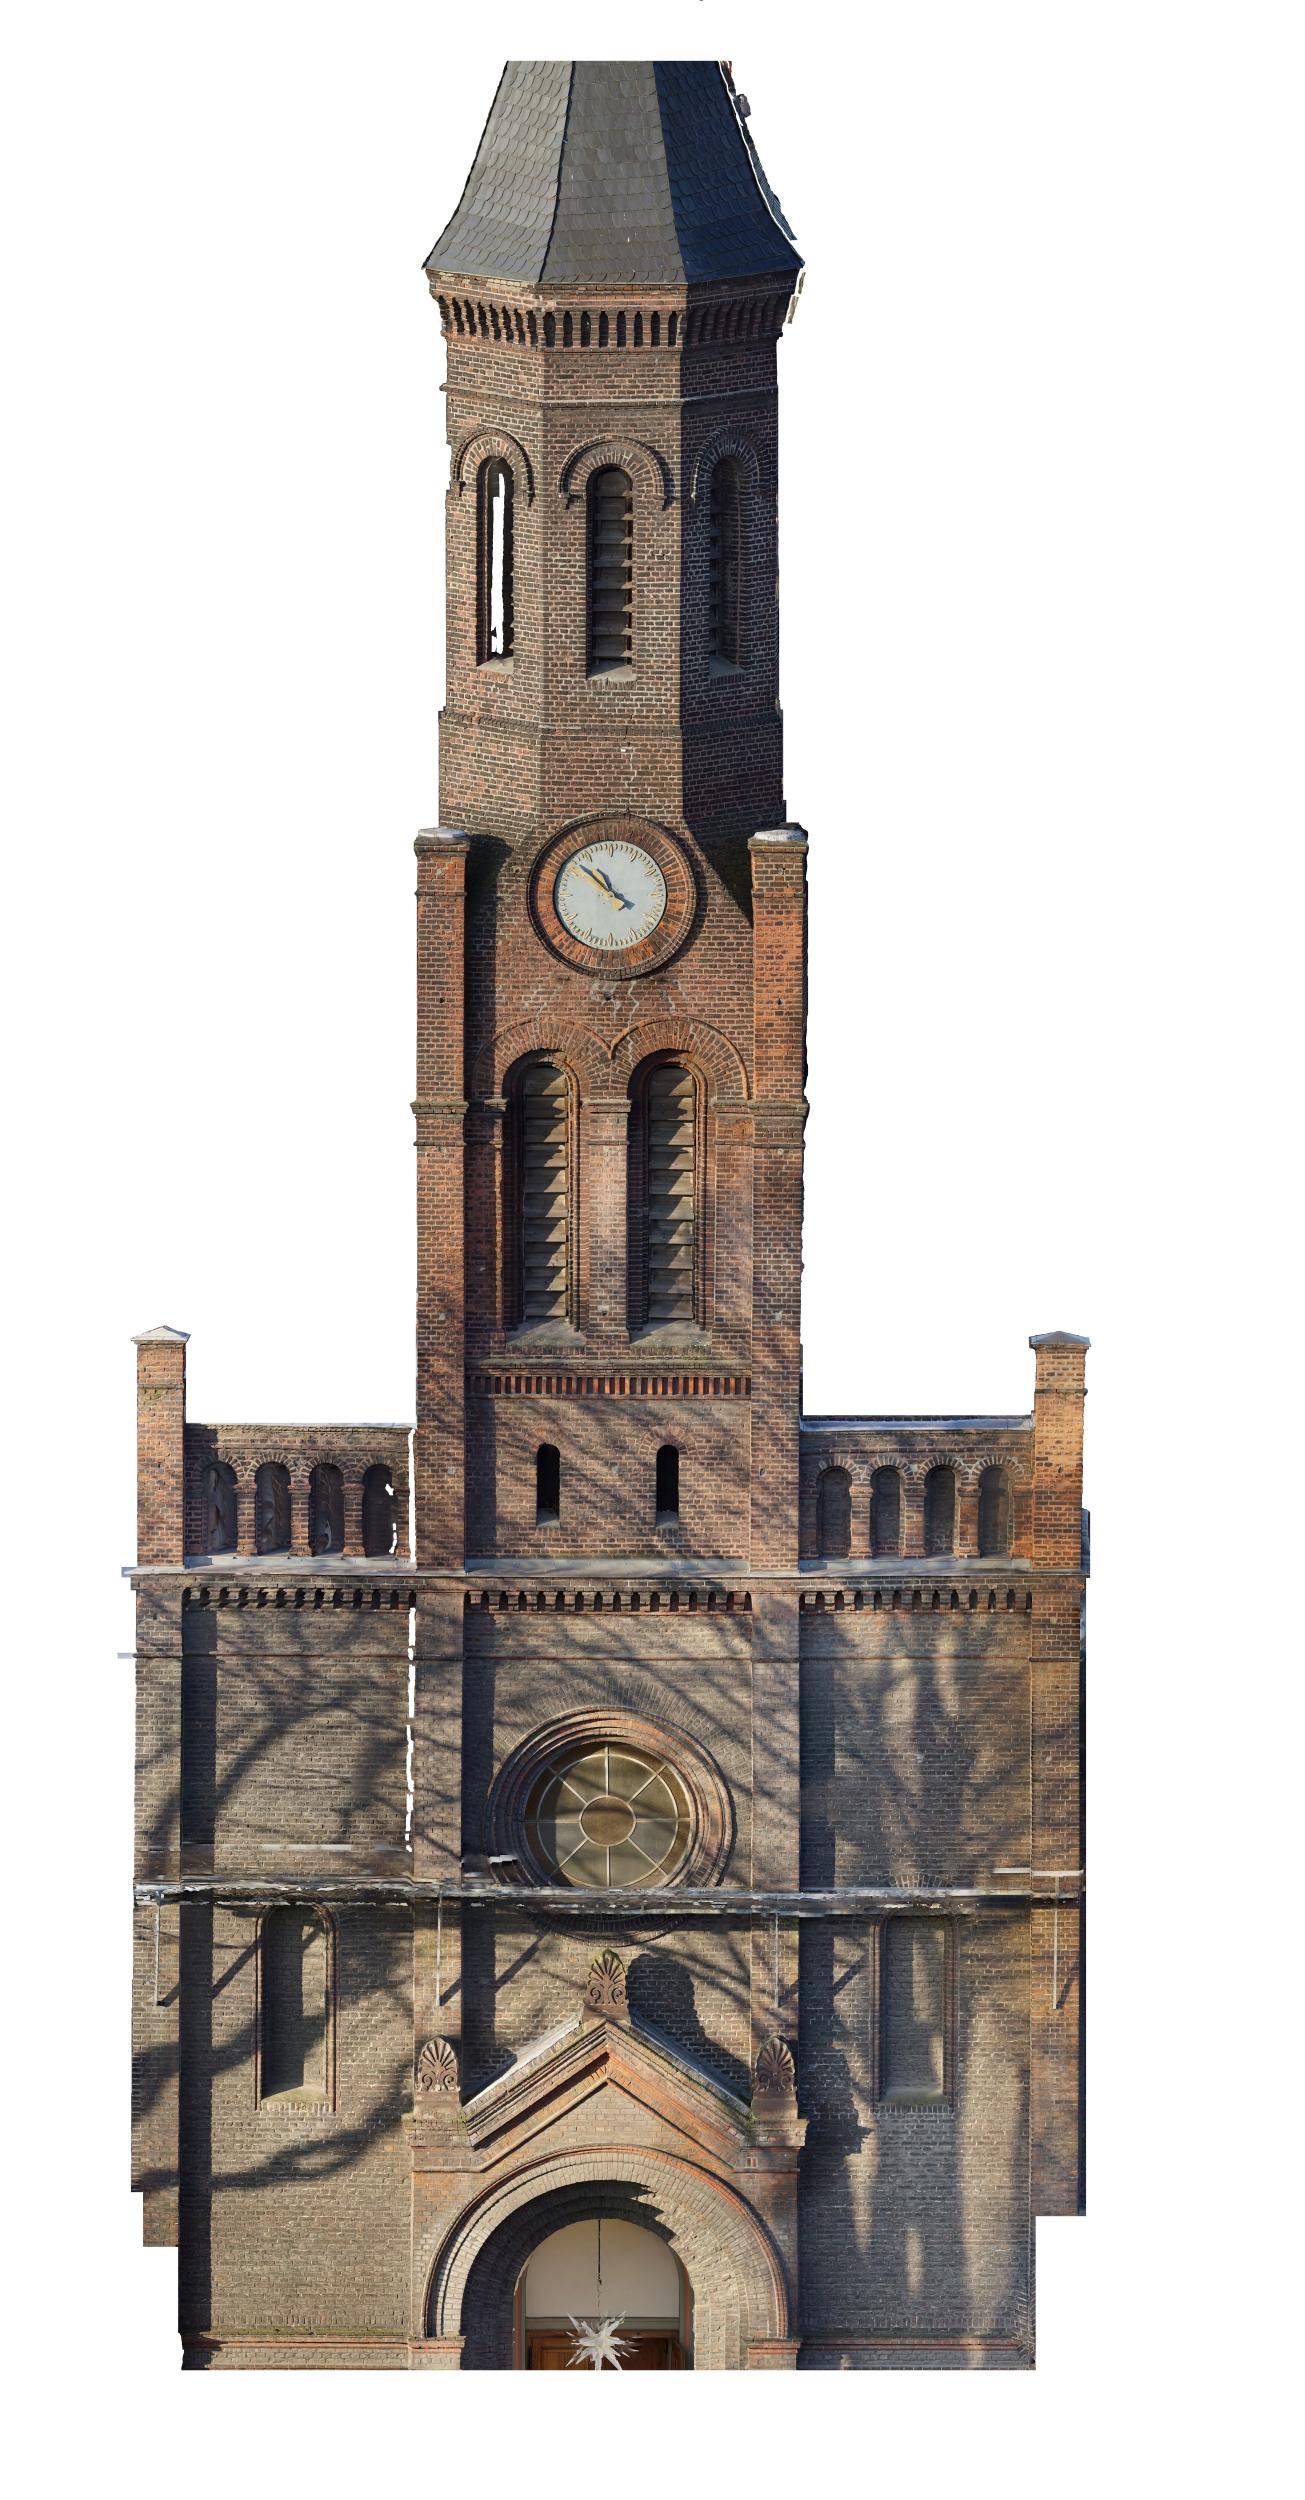 3D-Laserscanning Photogrammetrie 3D-Vermessung Aufmaß Bauwerksdokumentation Architektur Duisburg NRW